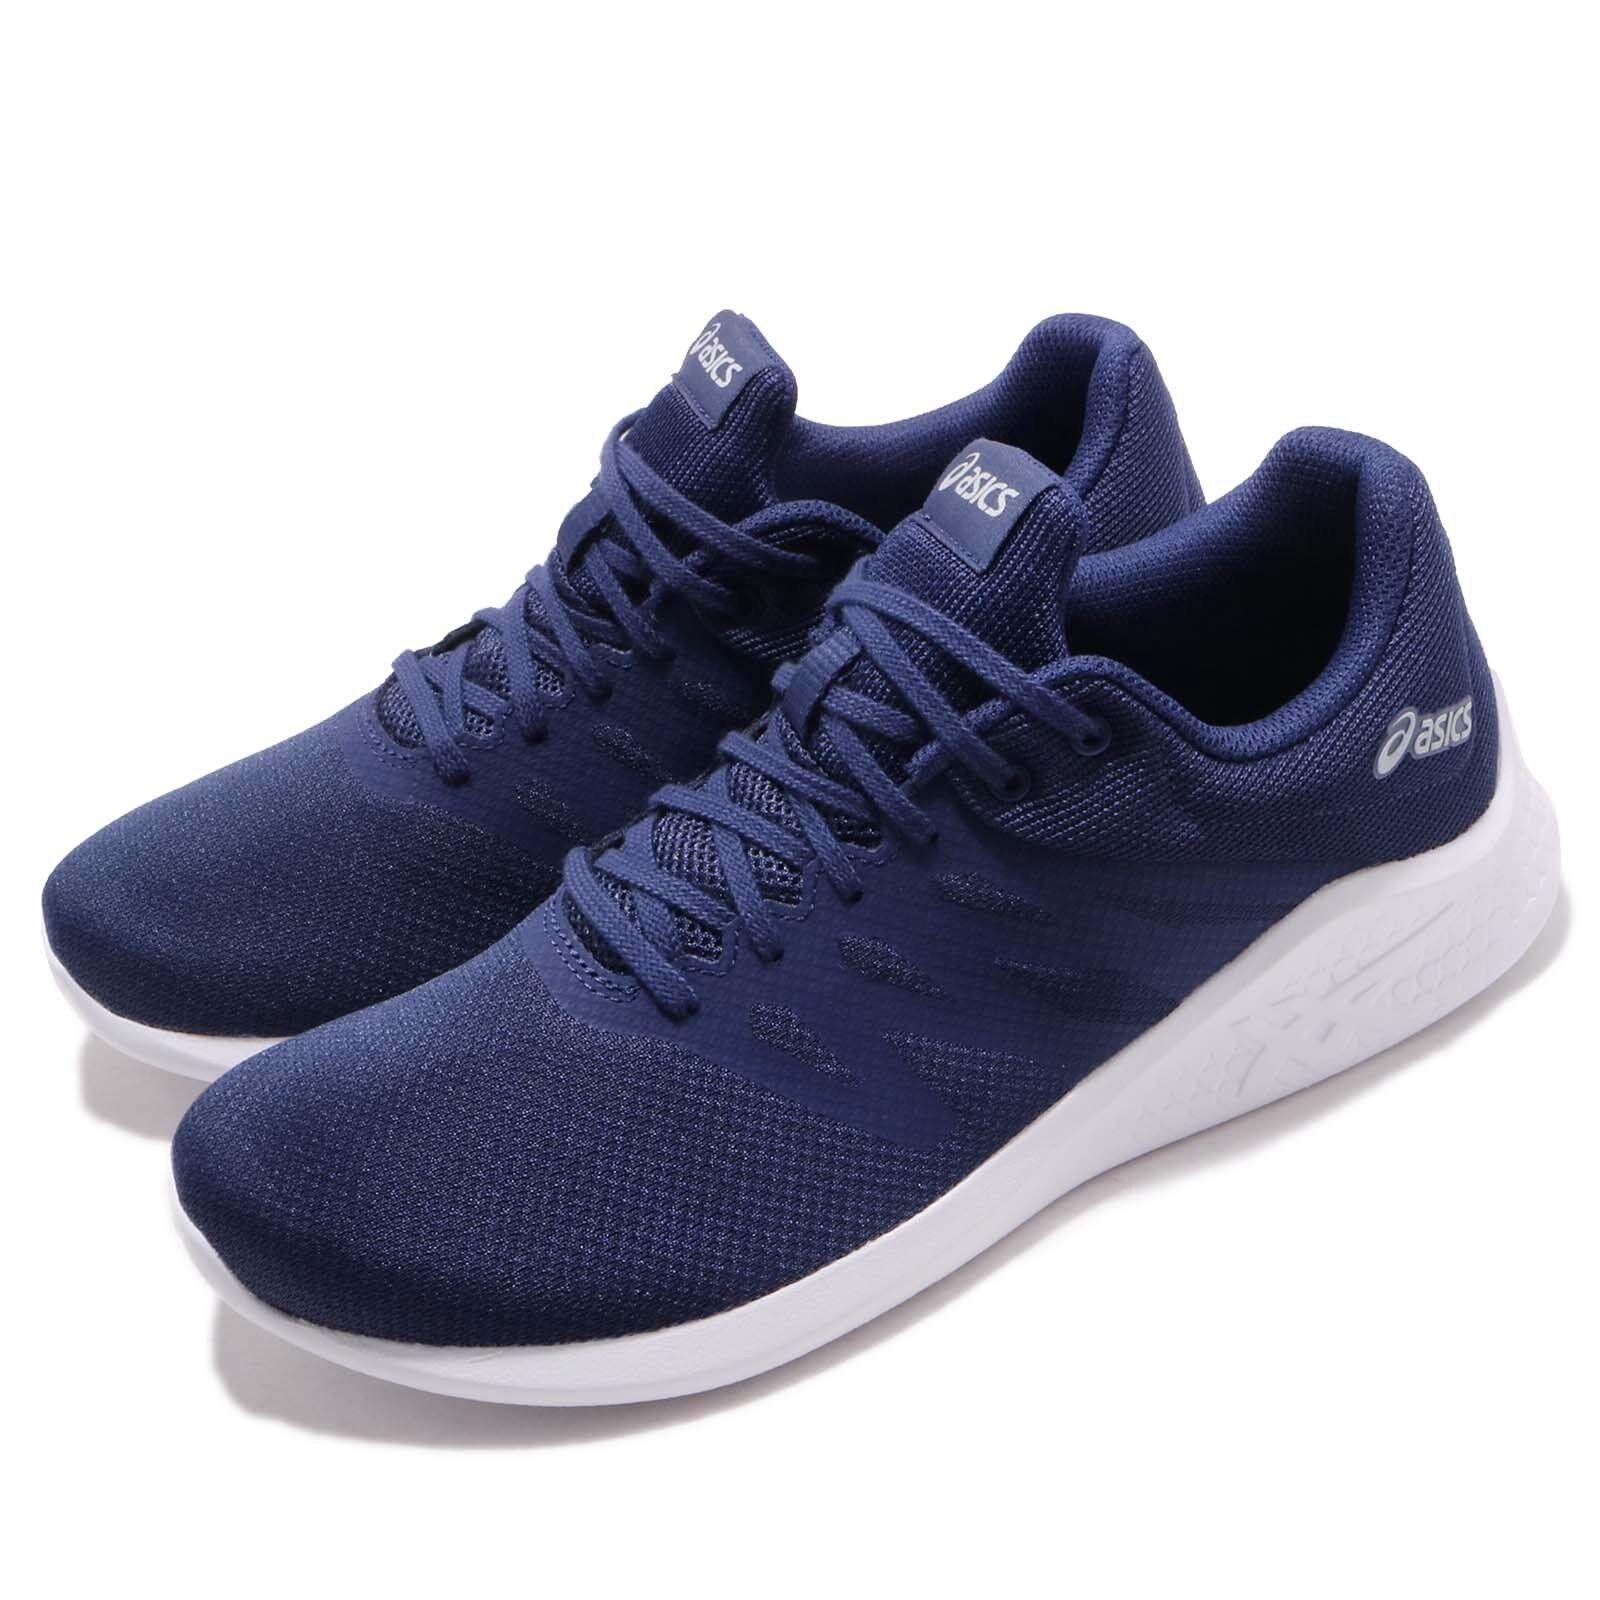 Asics Comutora Indigo blueee White Mens Running shoes Runner Sneakers 1021A046-400